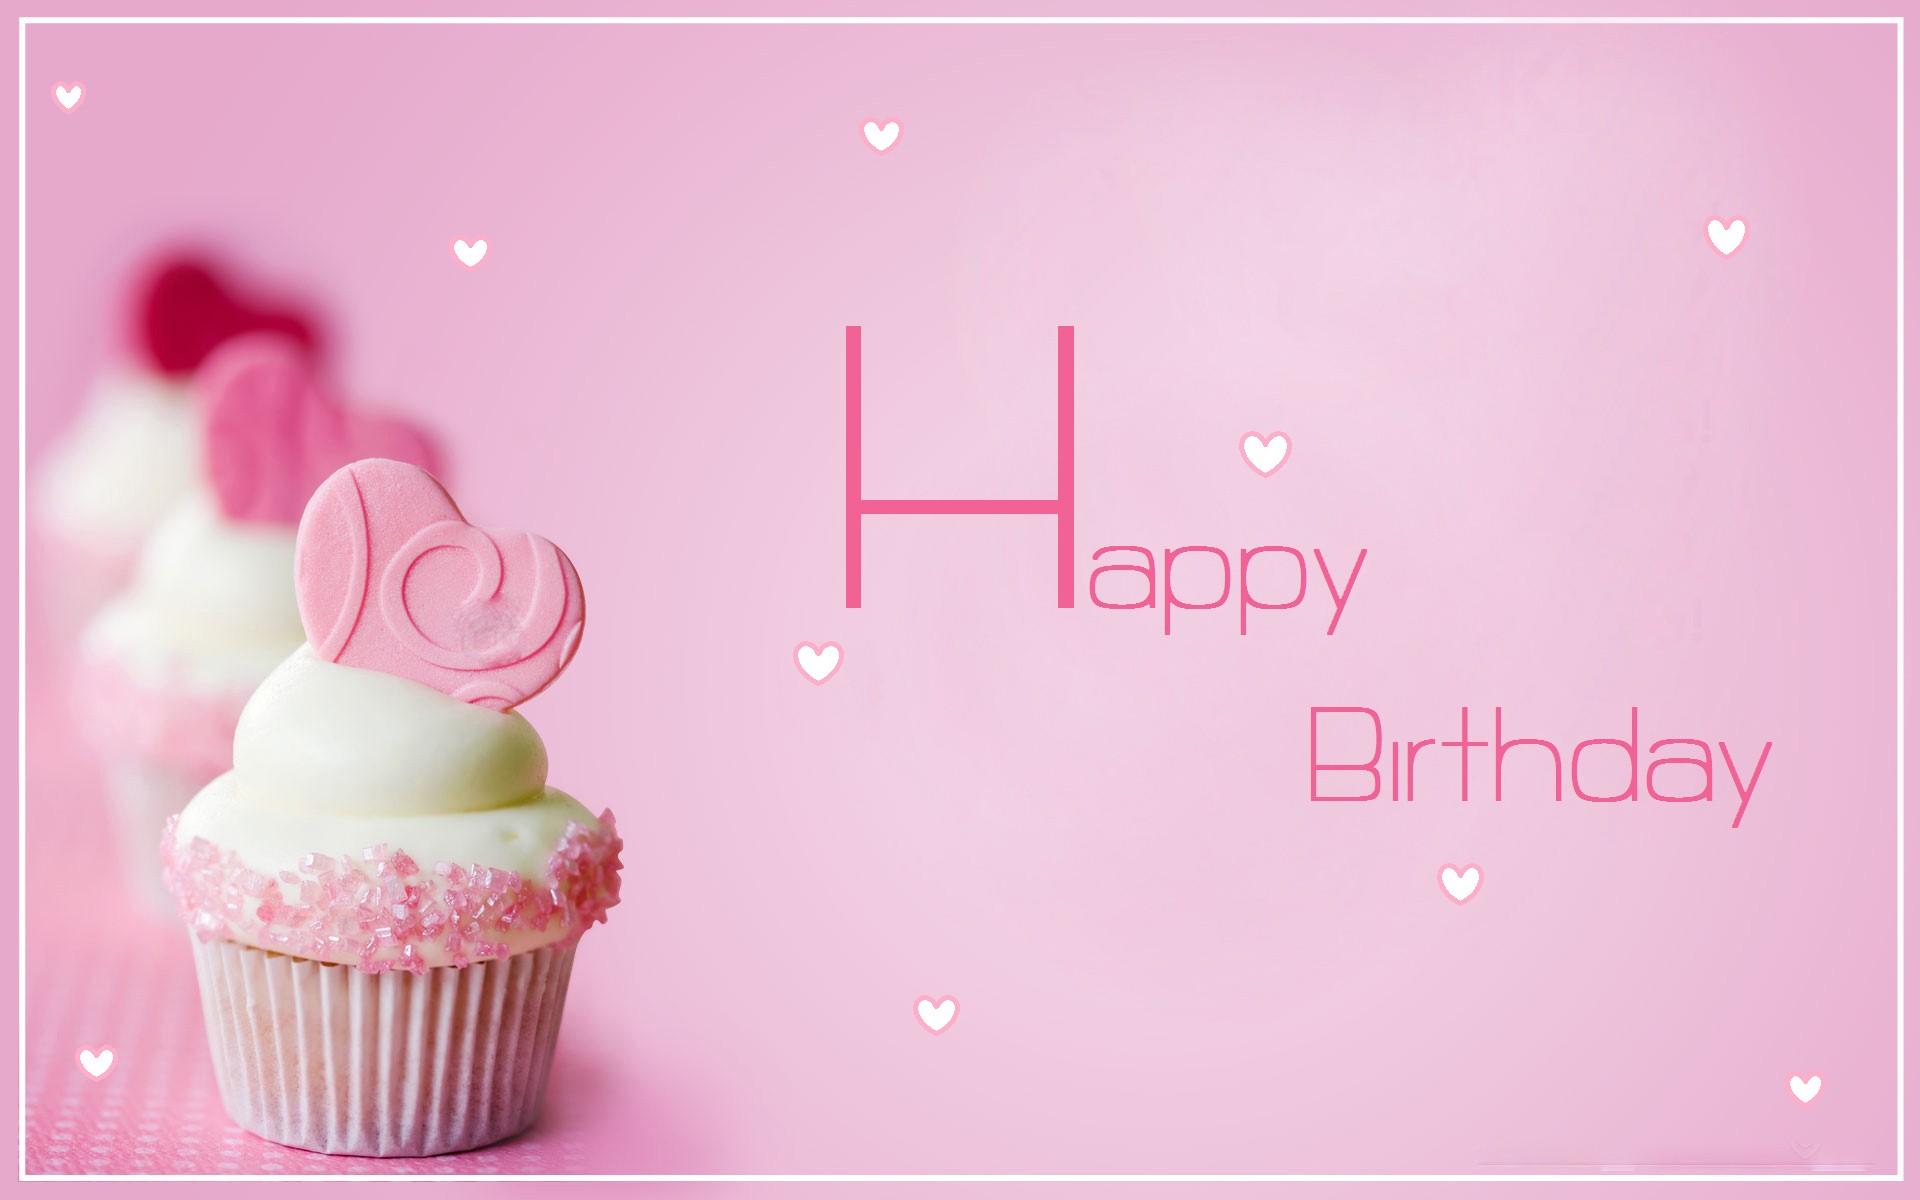 happy birthday wallpaper free download 1920x1200